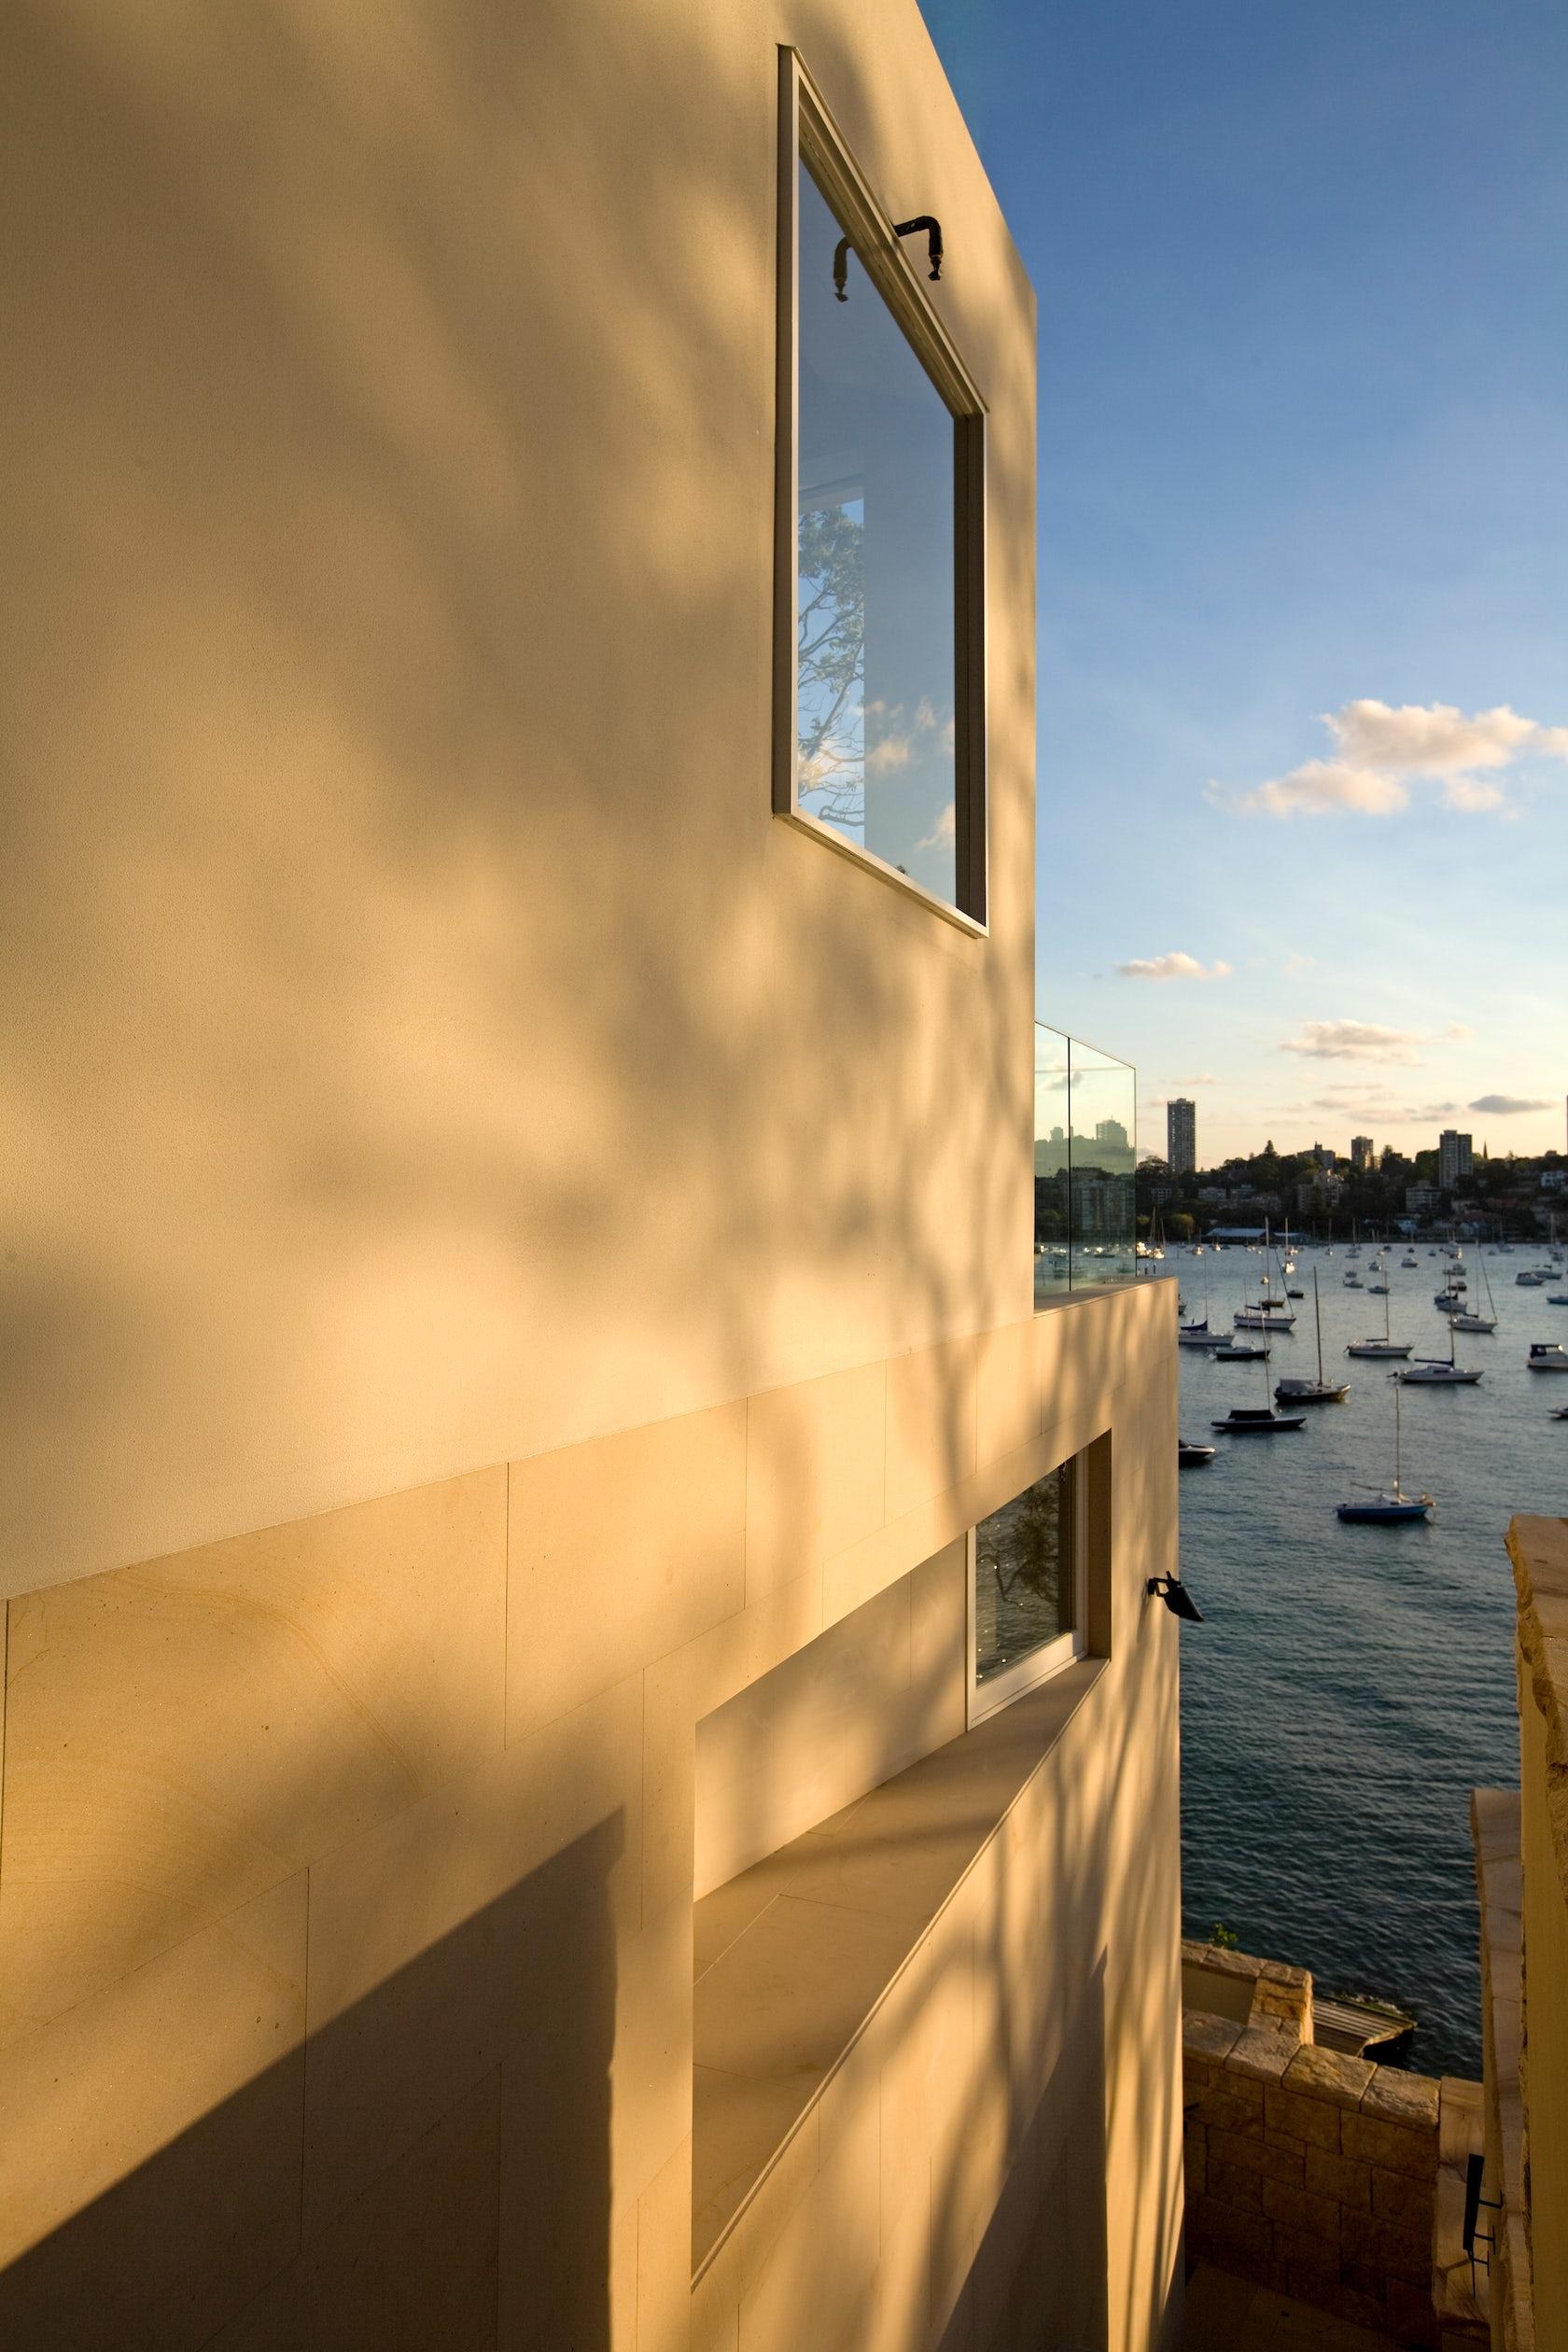 Harbourside Apartments & Boathouse - Architizer